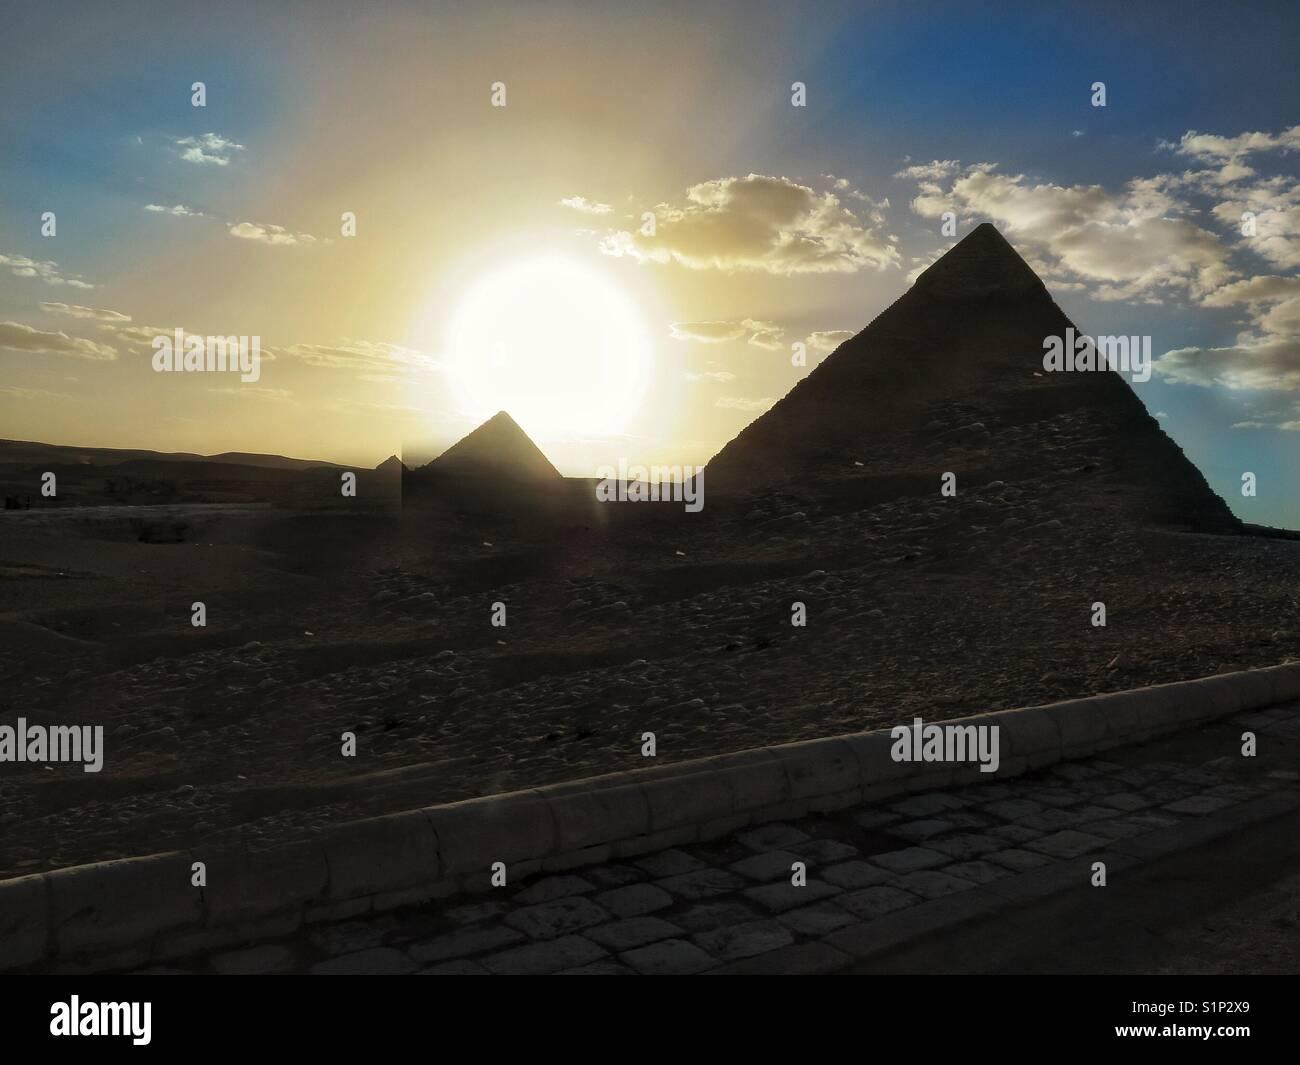 Pyramids, Cairo, Egypt - Stock Image